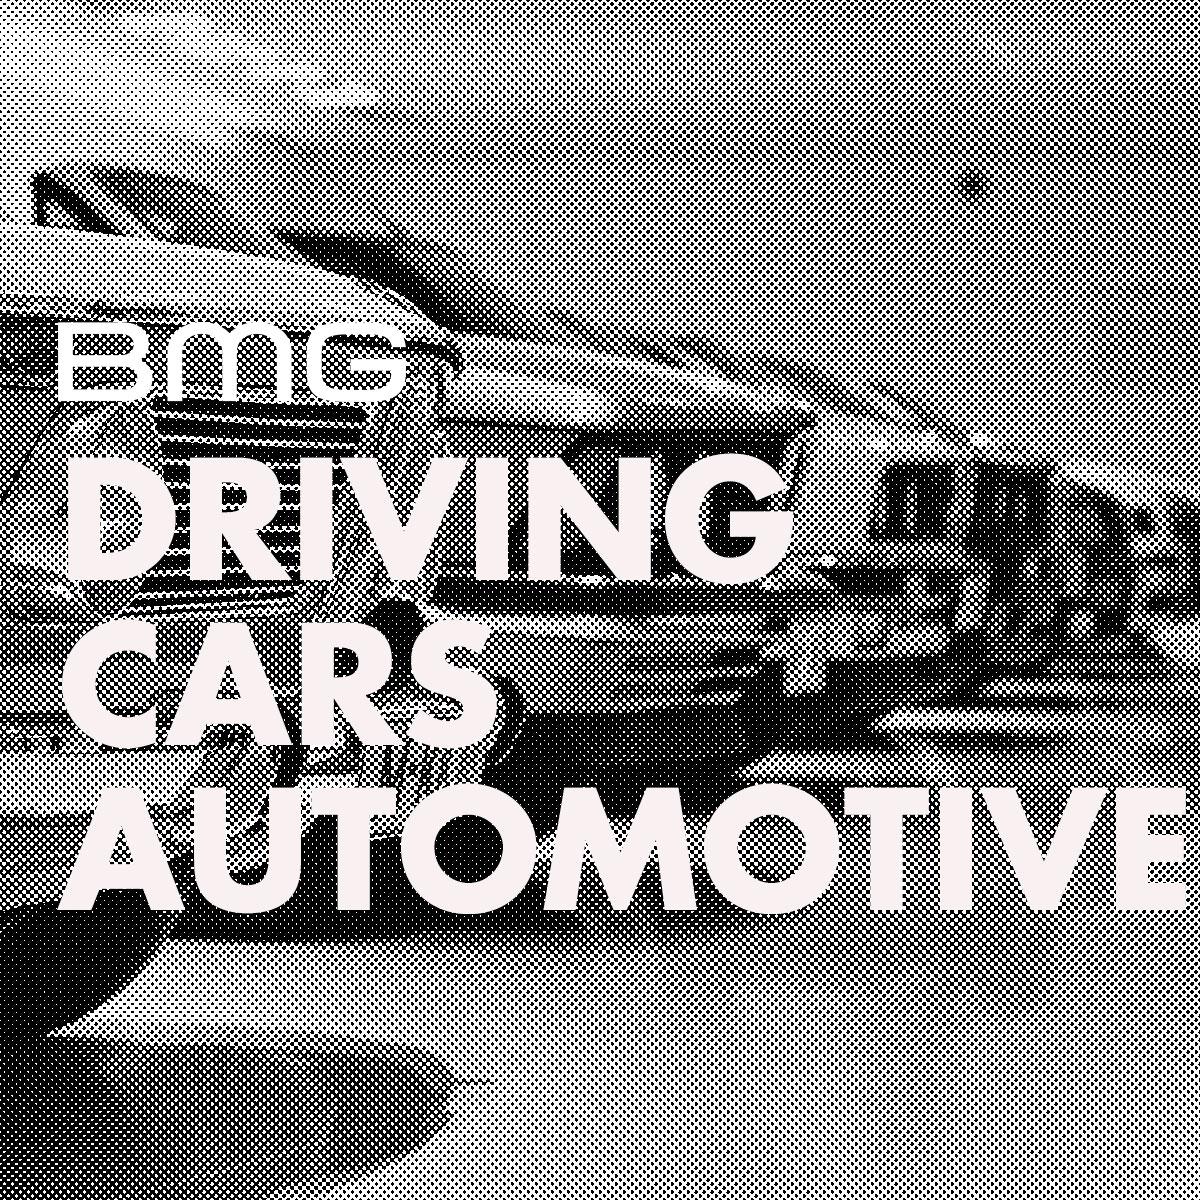 1200-x-1200-Driving-Cars-Automotive.jpg